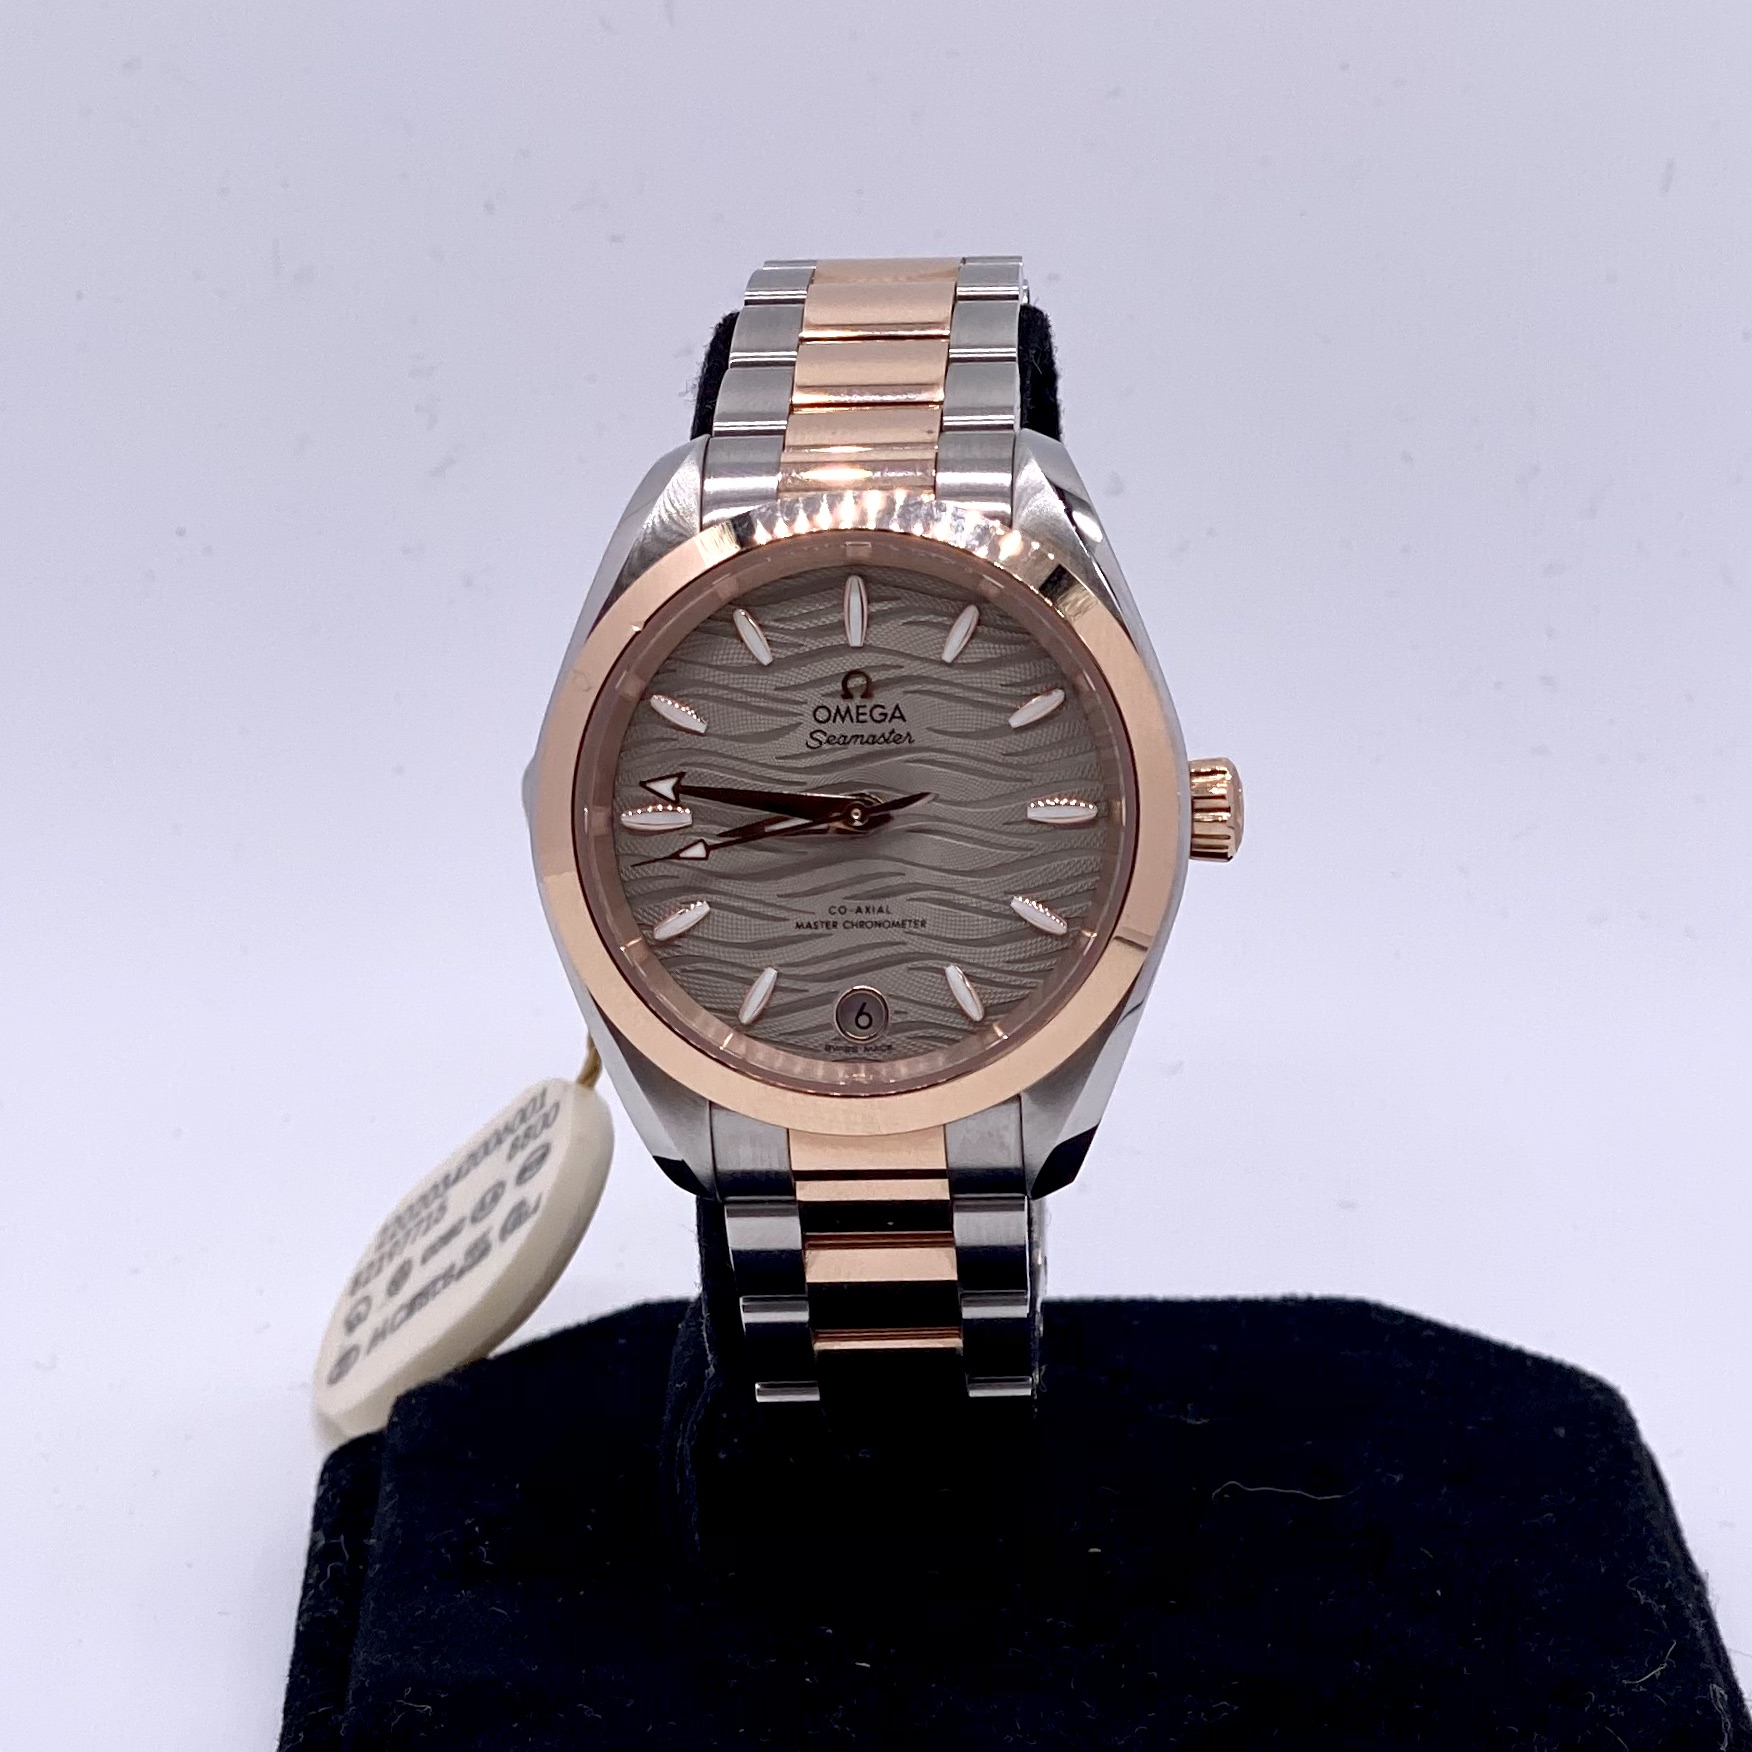 Omega Seamaster Aqua Terra Ladies Watch ref 22020342006001